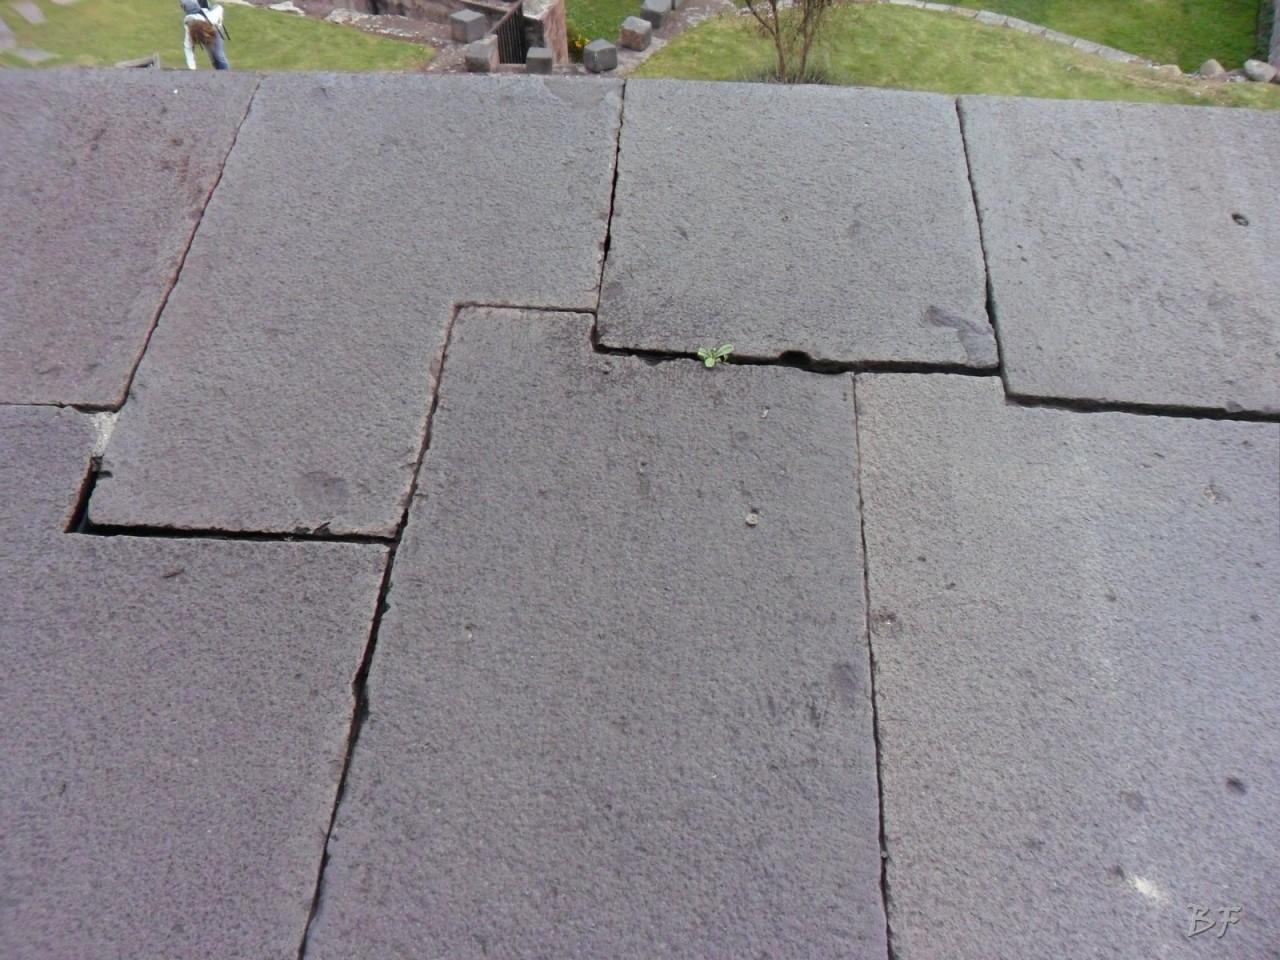 Mura-Poligonali-Megaliti-Tempio-Coricancha-Cusco-Perù-49